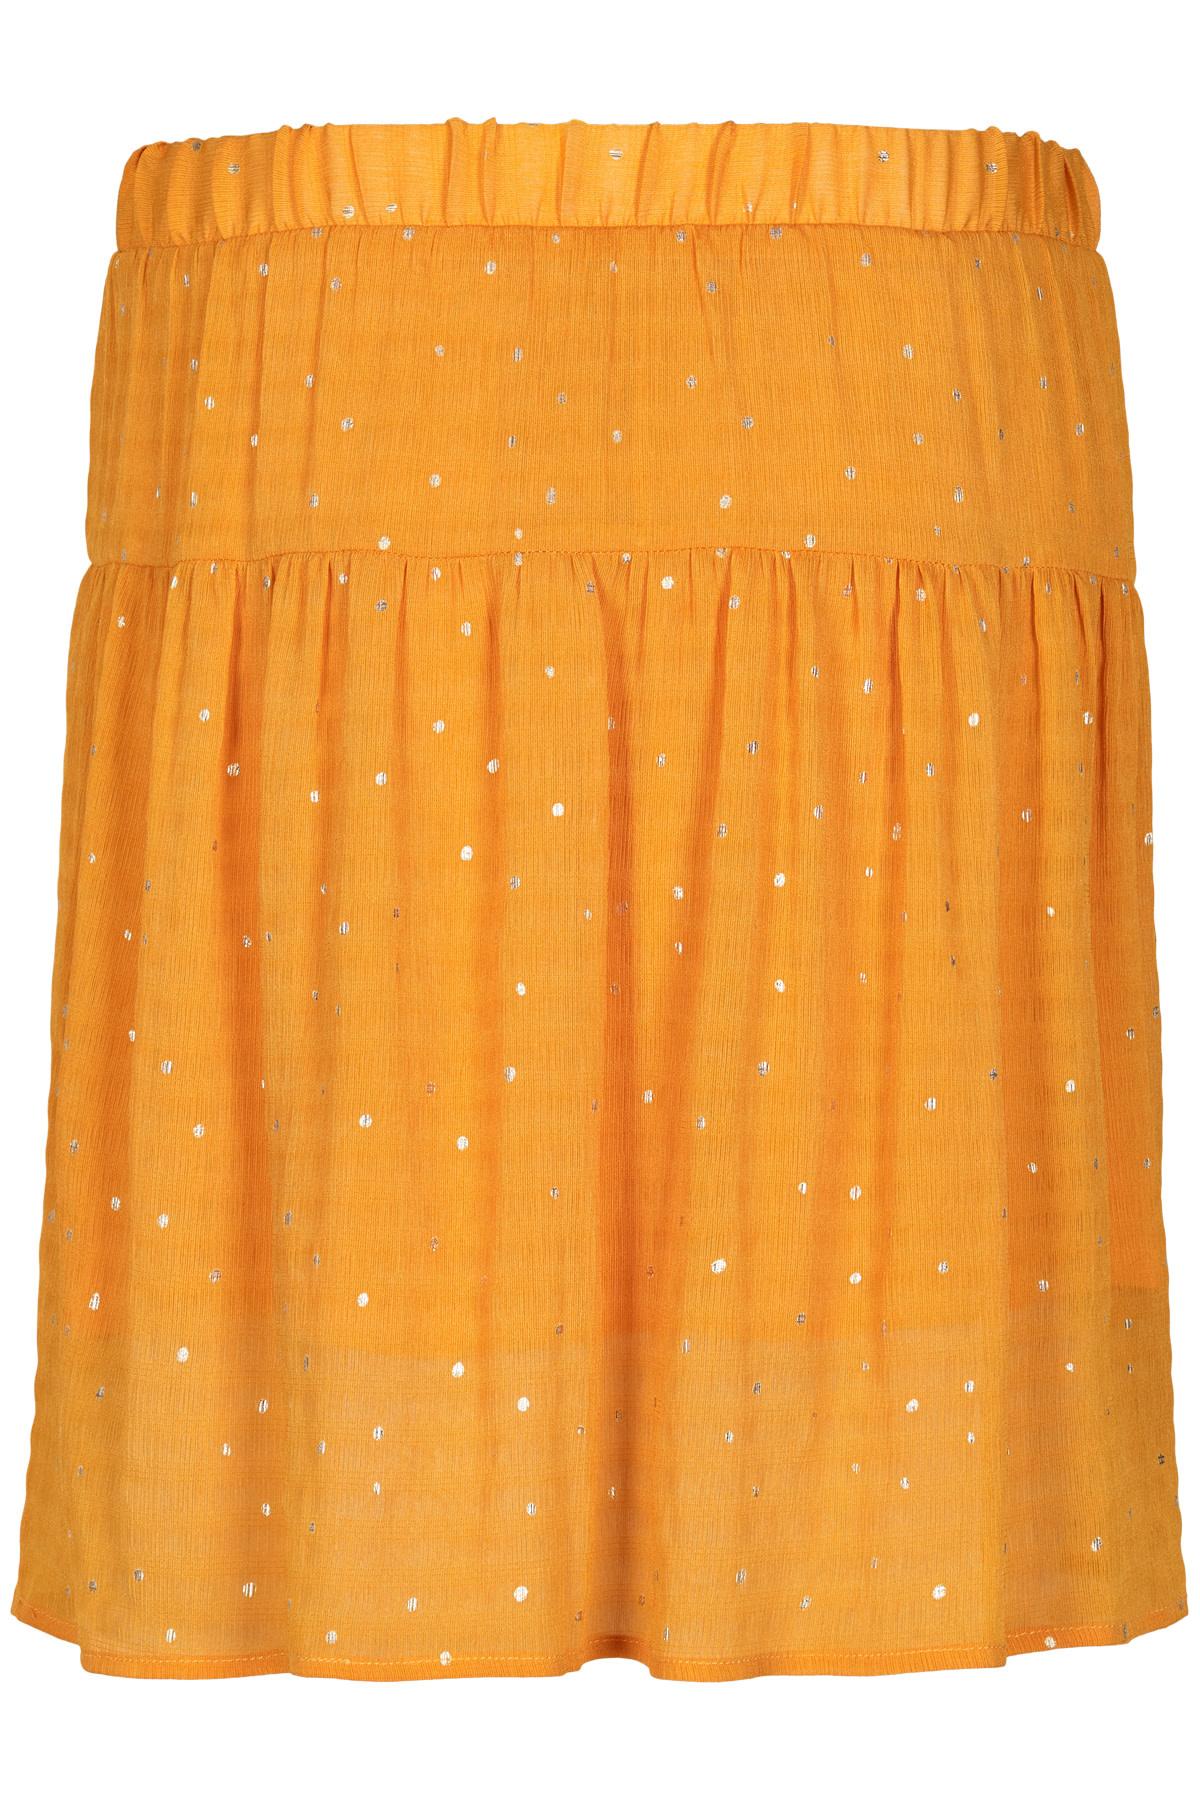 Nümph Lougenia Skirt